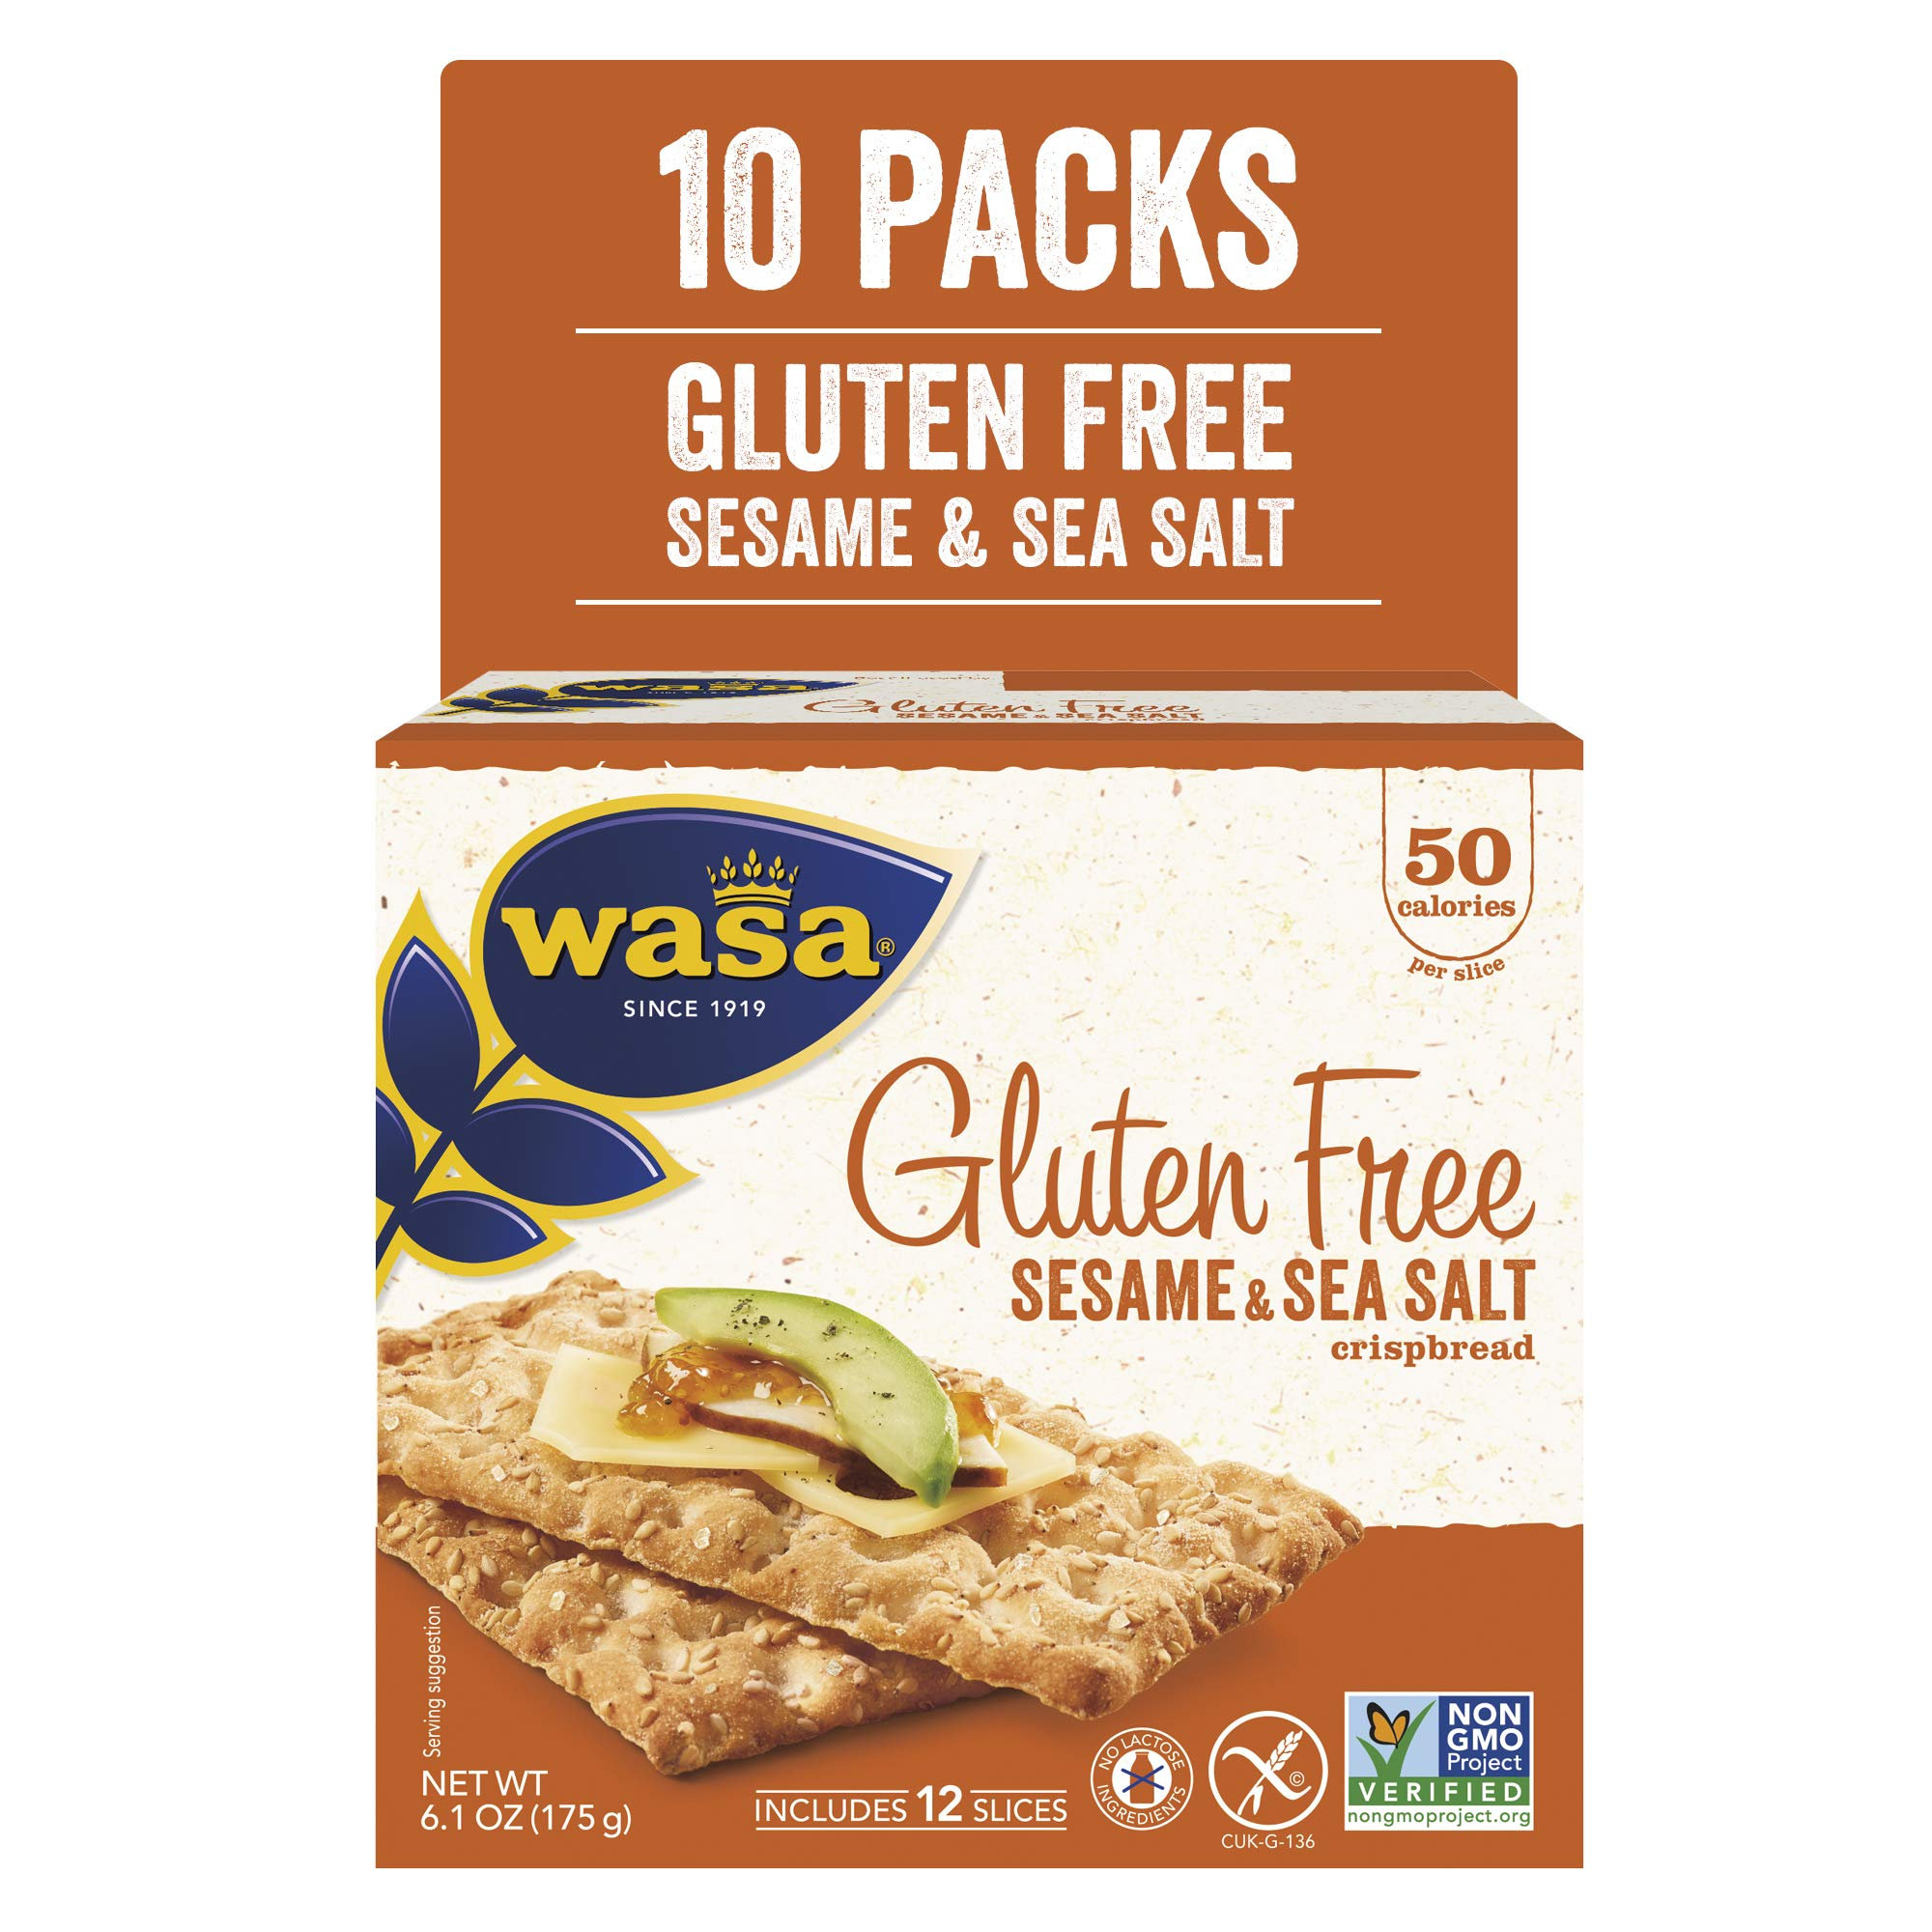 Wasa Gluten Free Sesame & Sea Salt Crispbread, 6.1 oz (Pack of 10) by Wasa